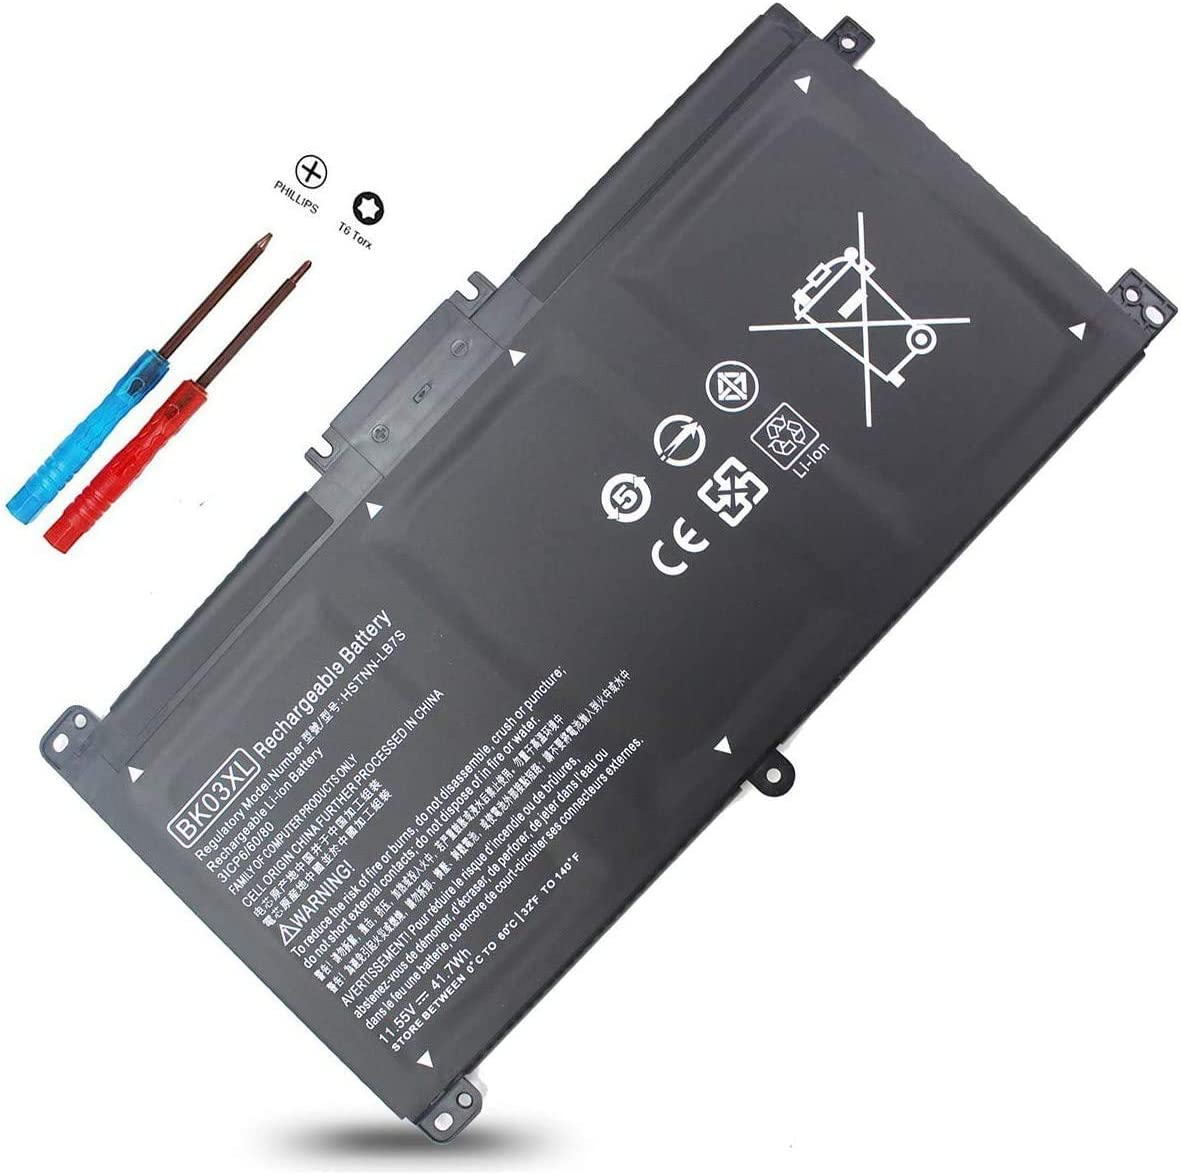 BK03XL TPN-W125 Battery for Hp Pavilion X360 14m-ba0xx 14m-ba013dx 14m-ba011dx 14m-ba1xx 14m-ba114dx 14-ba175nr 14-ba253cl 14-ba125cl 14-ba051cl 916811-855 916812-855 916366-421 541HSTNN-LB7S UB7G